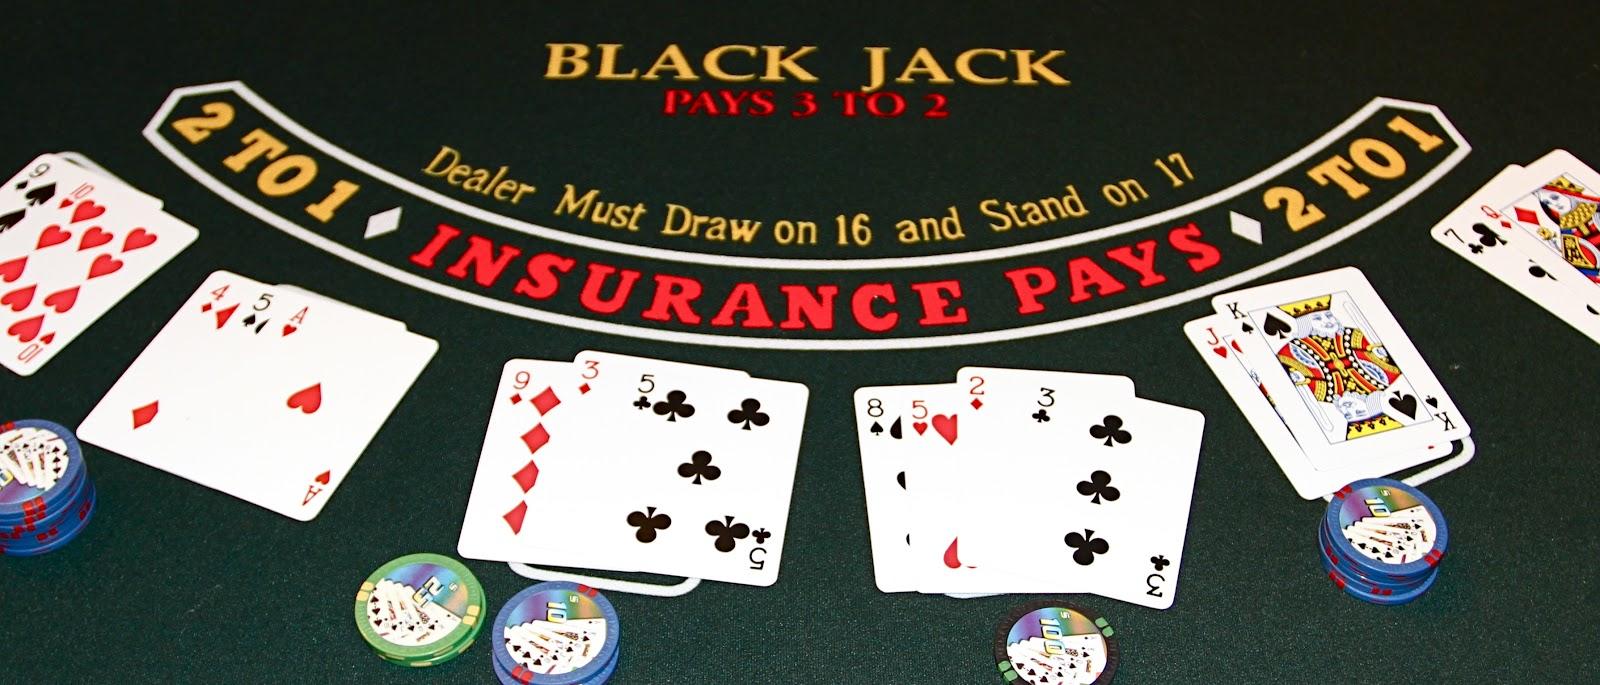 imagesblackjack-en-ligne-20.jpg